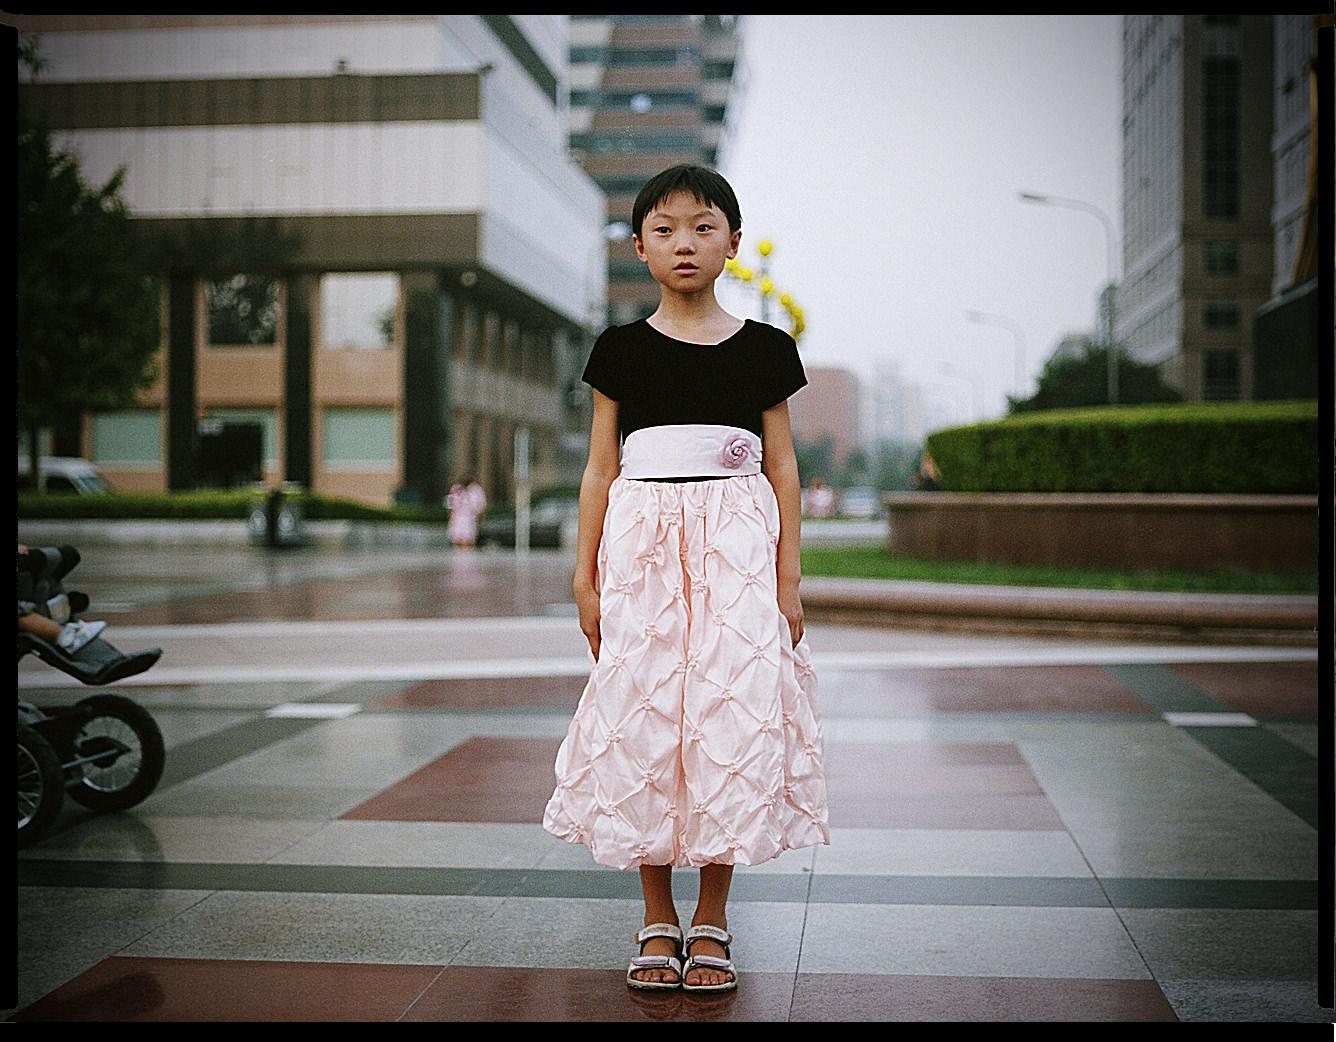 MediumFormatPatrikWallner_Beijing_BoyWearingGirlLOWQ-1